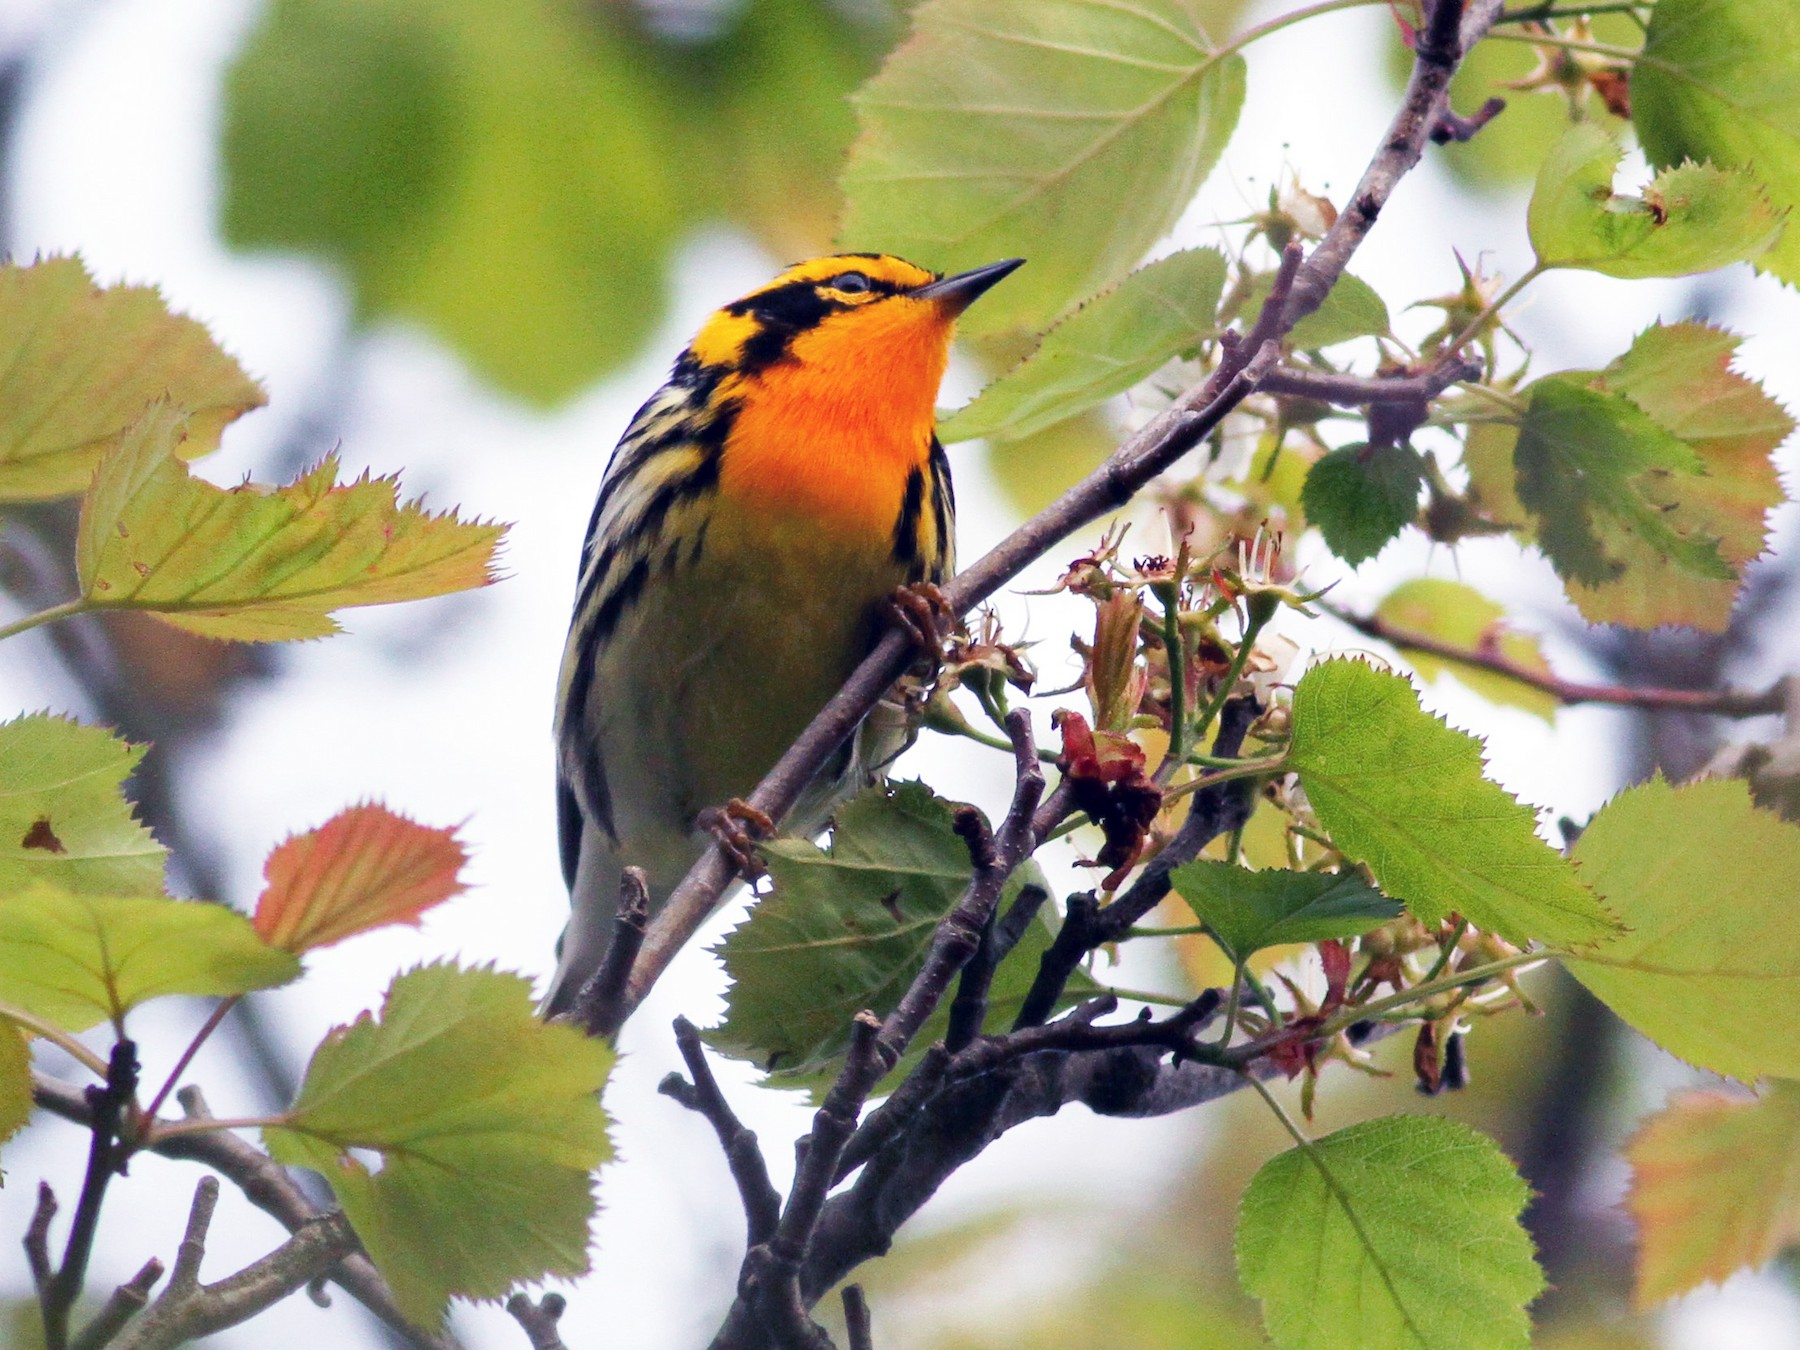 Blackburnian Warbler - Jay McGowan